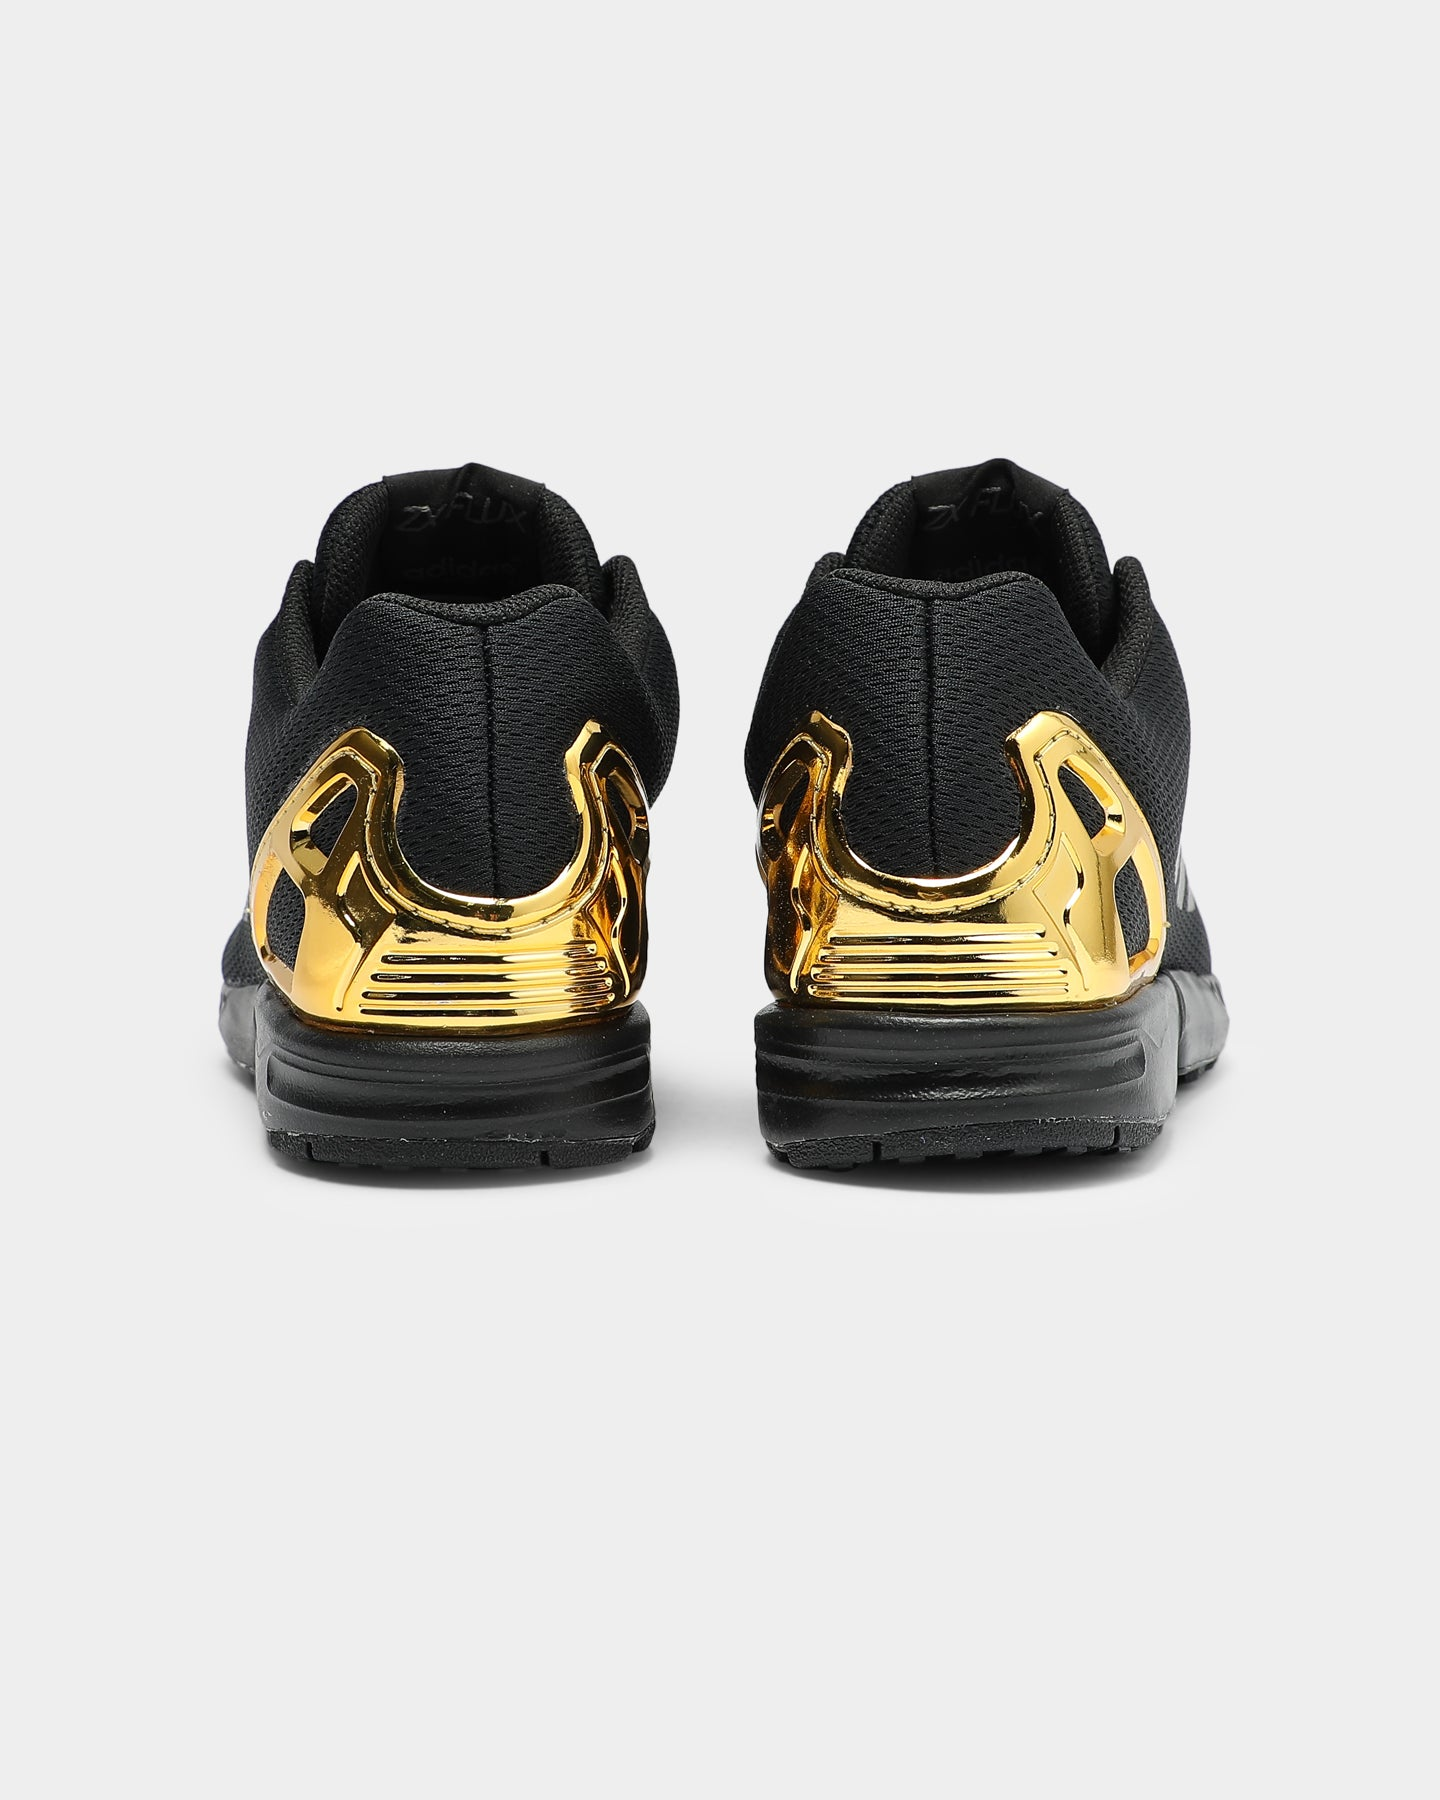 Adidas ZX Flux Black/Black/Gold